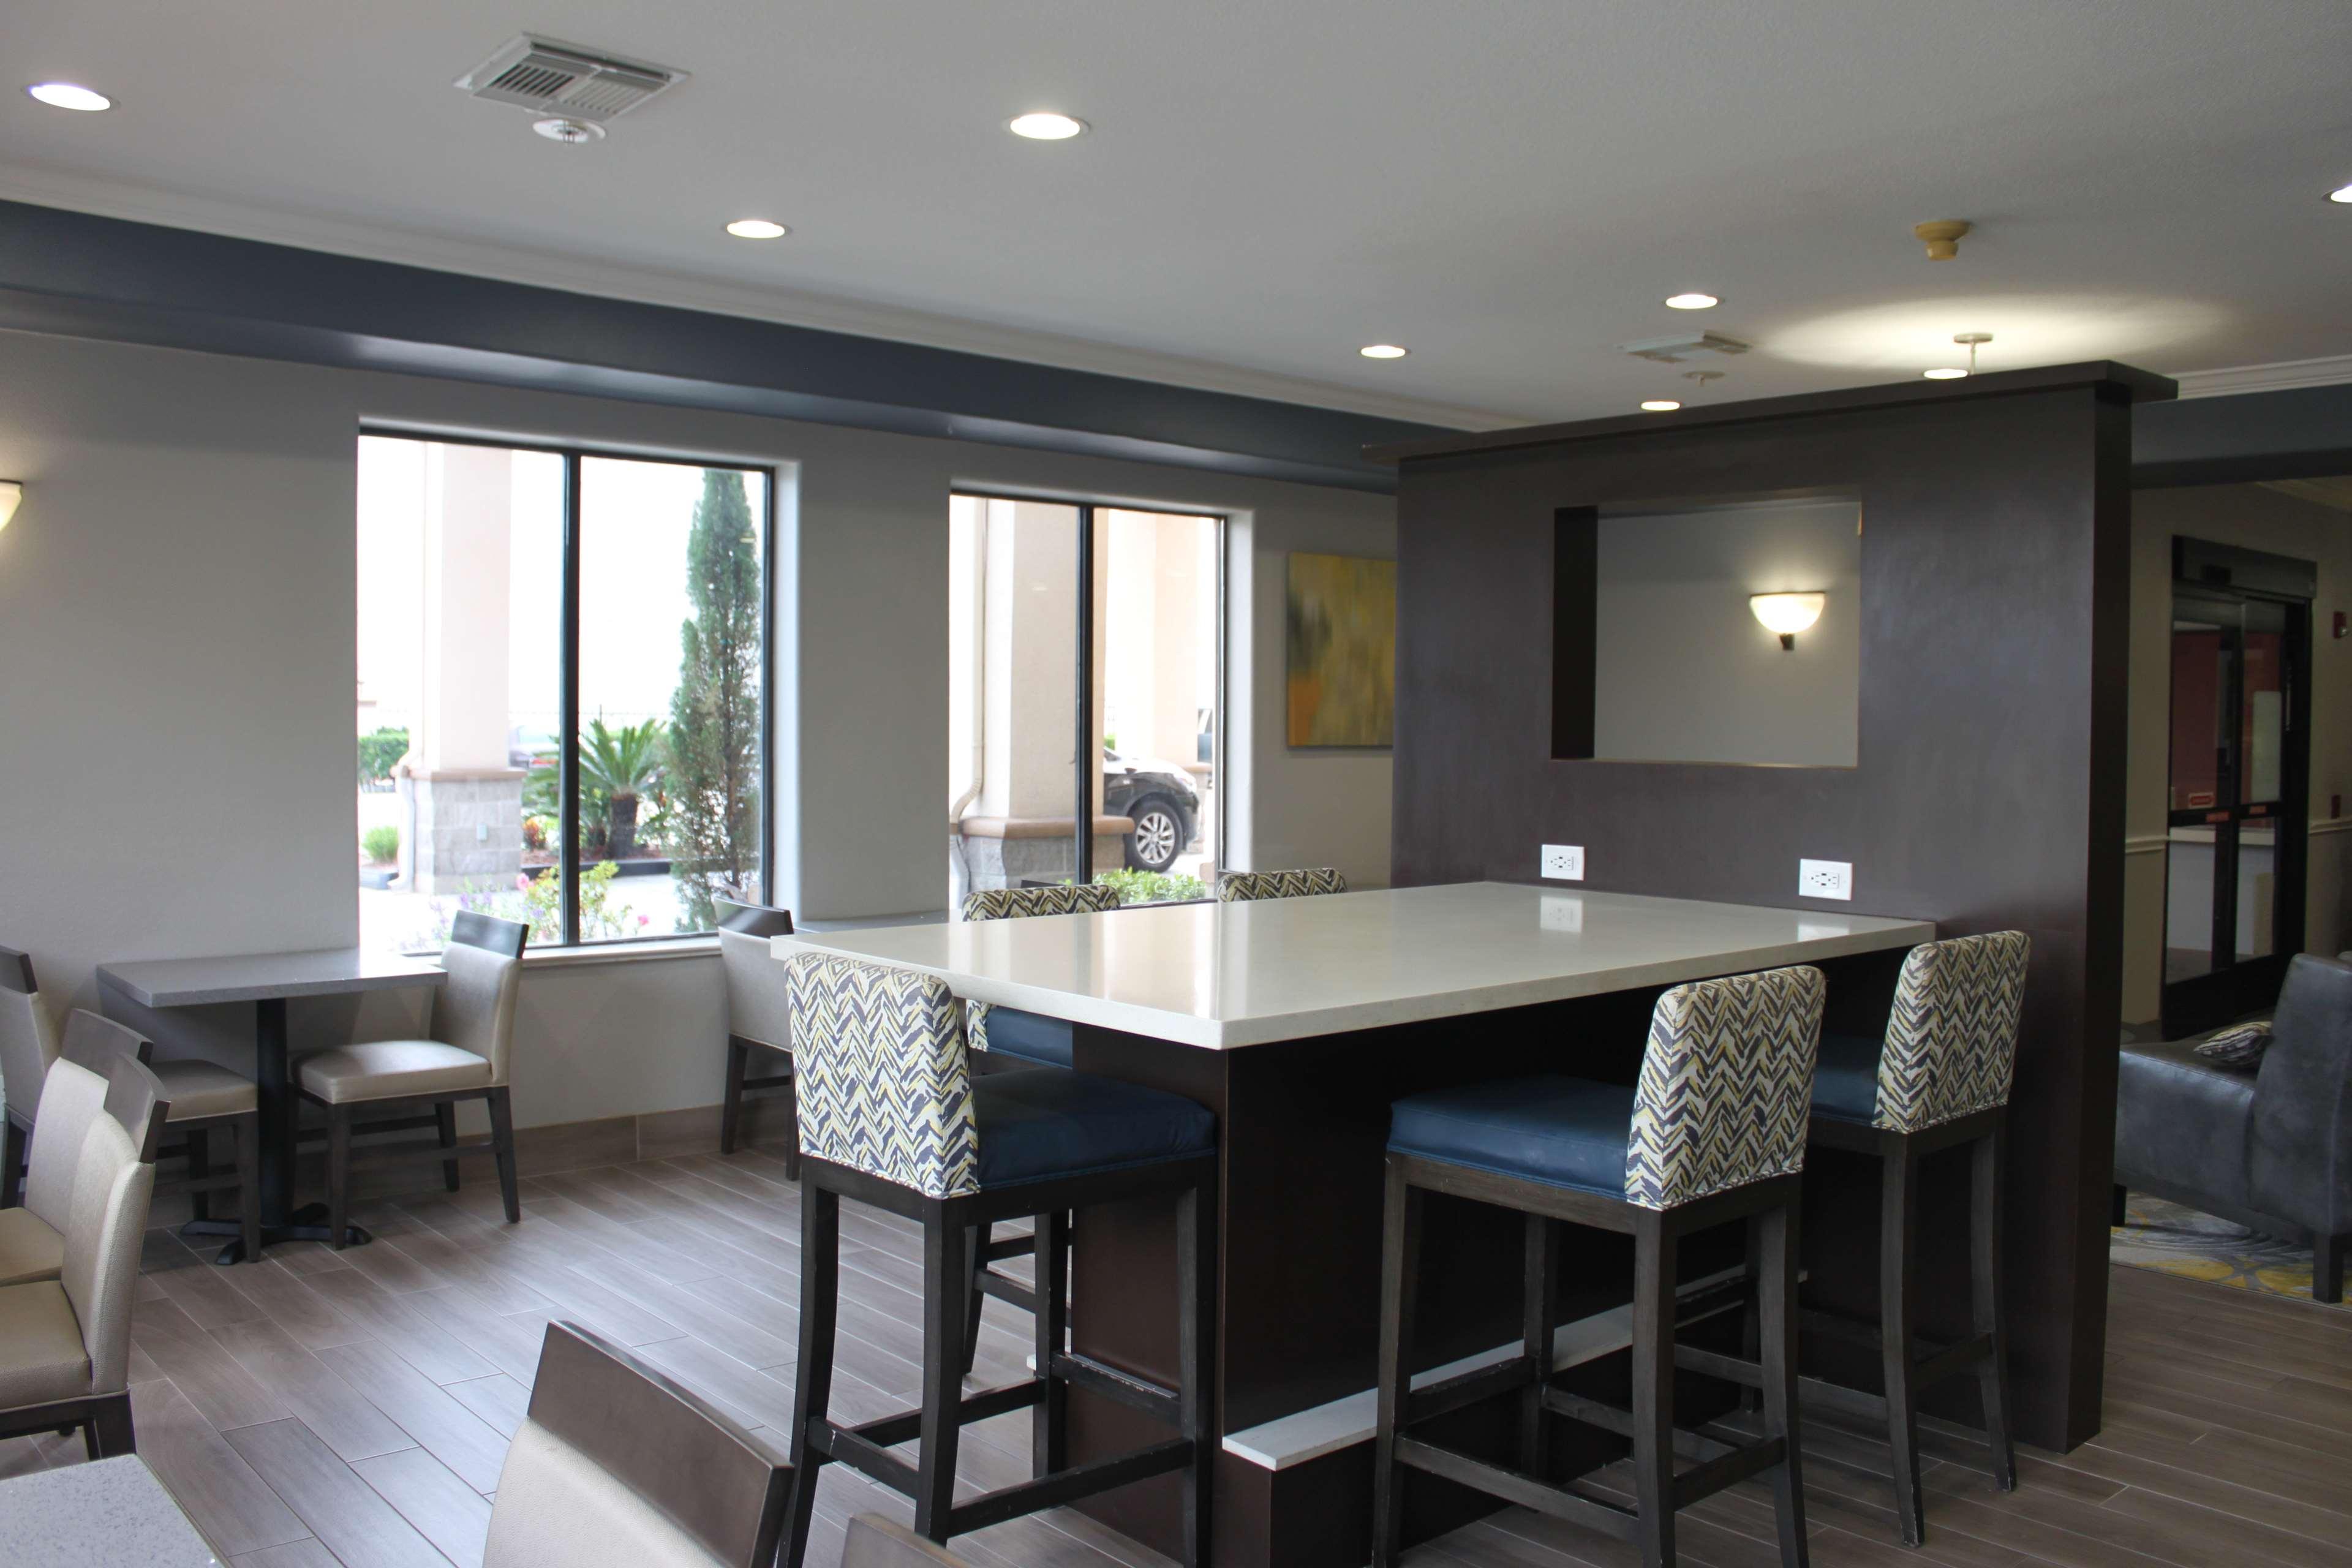 Best Western Plus North Houston Inn & Suites image 8